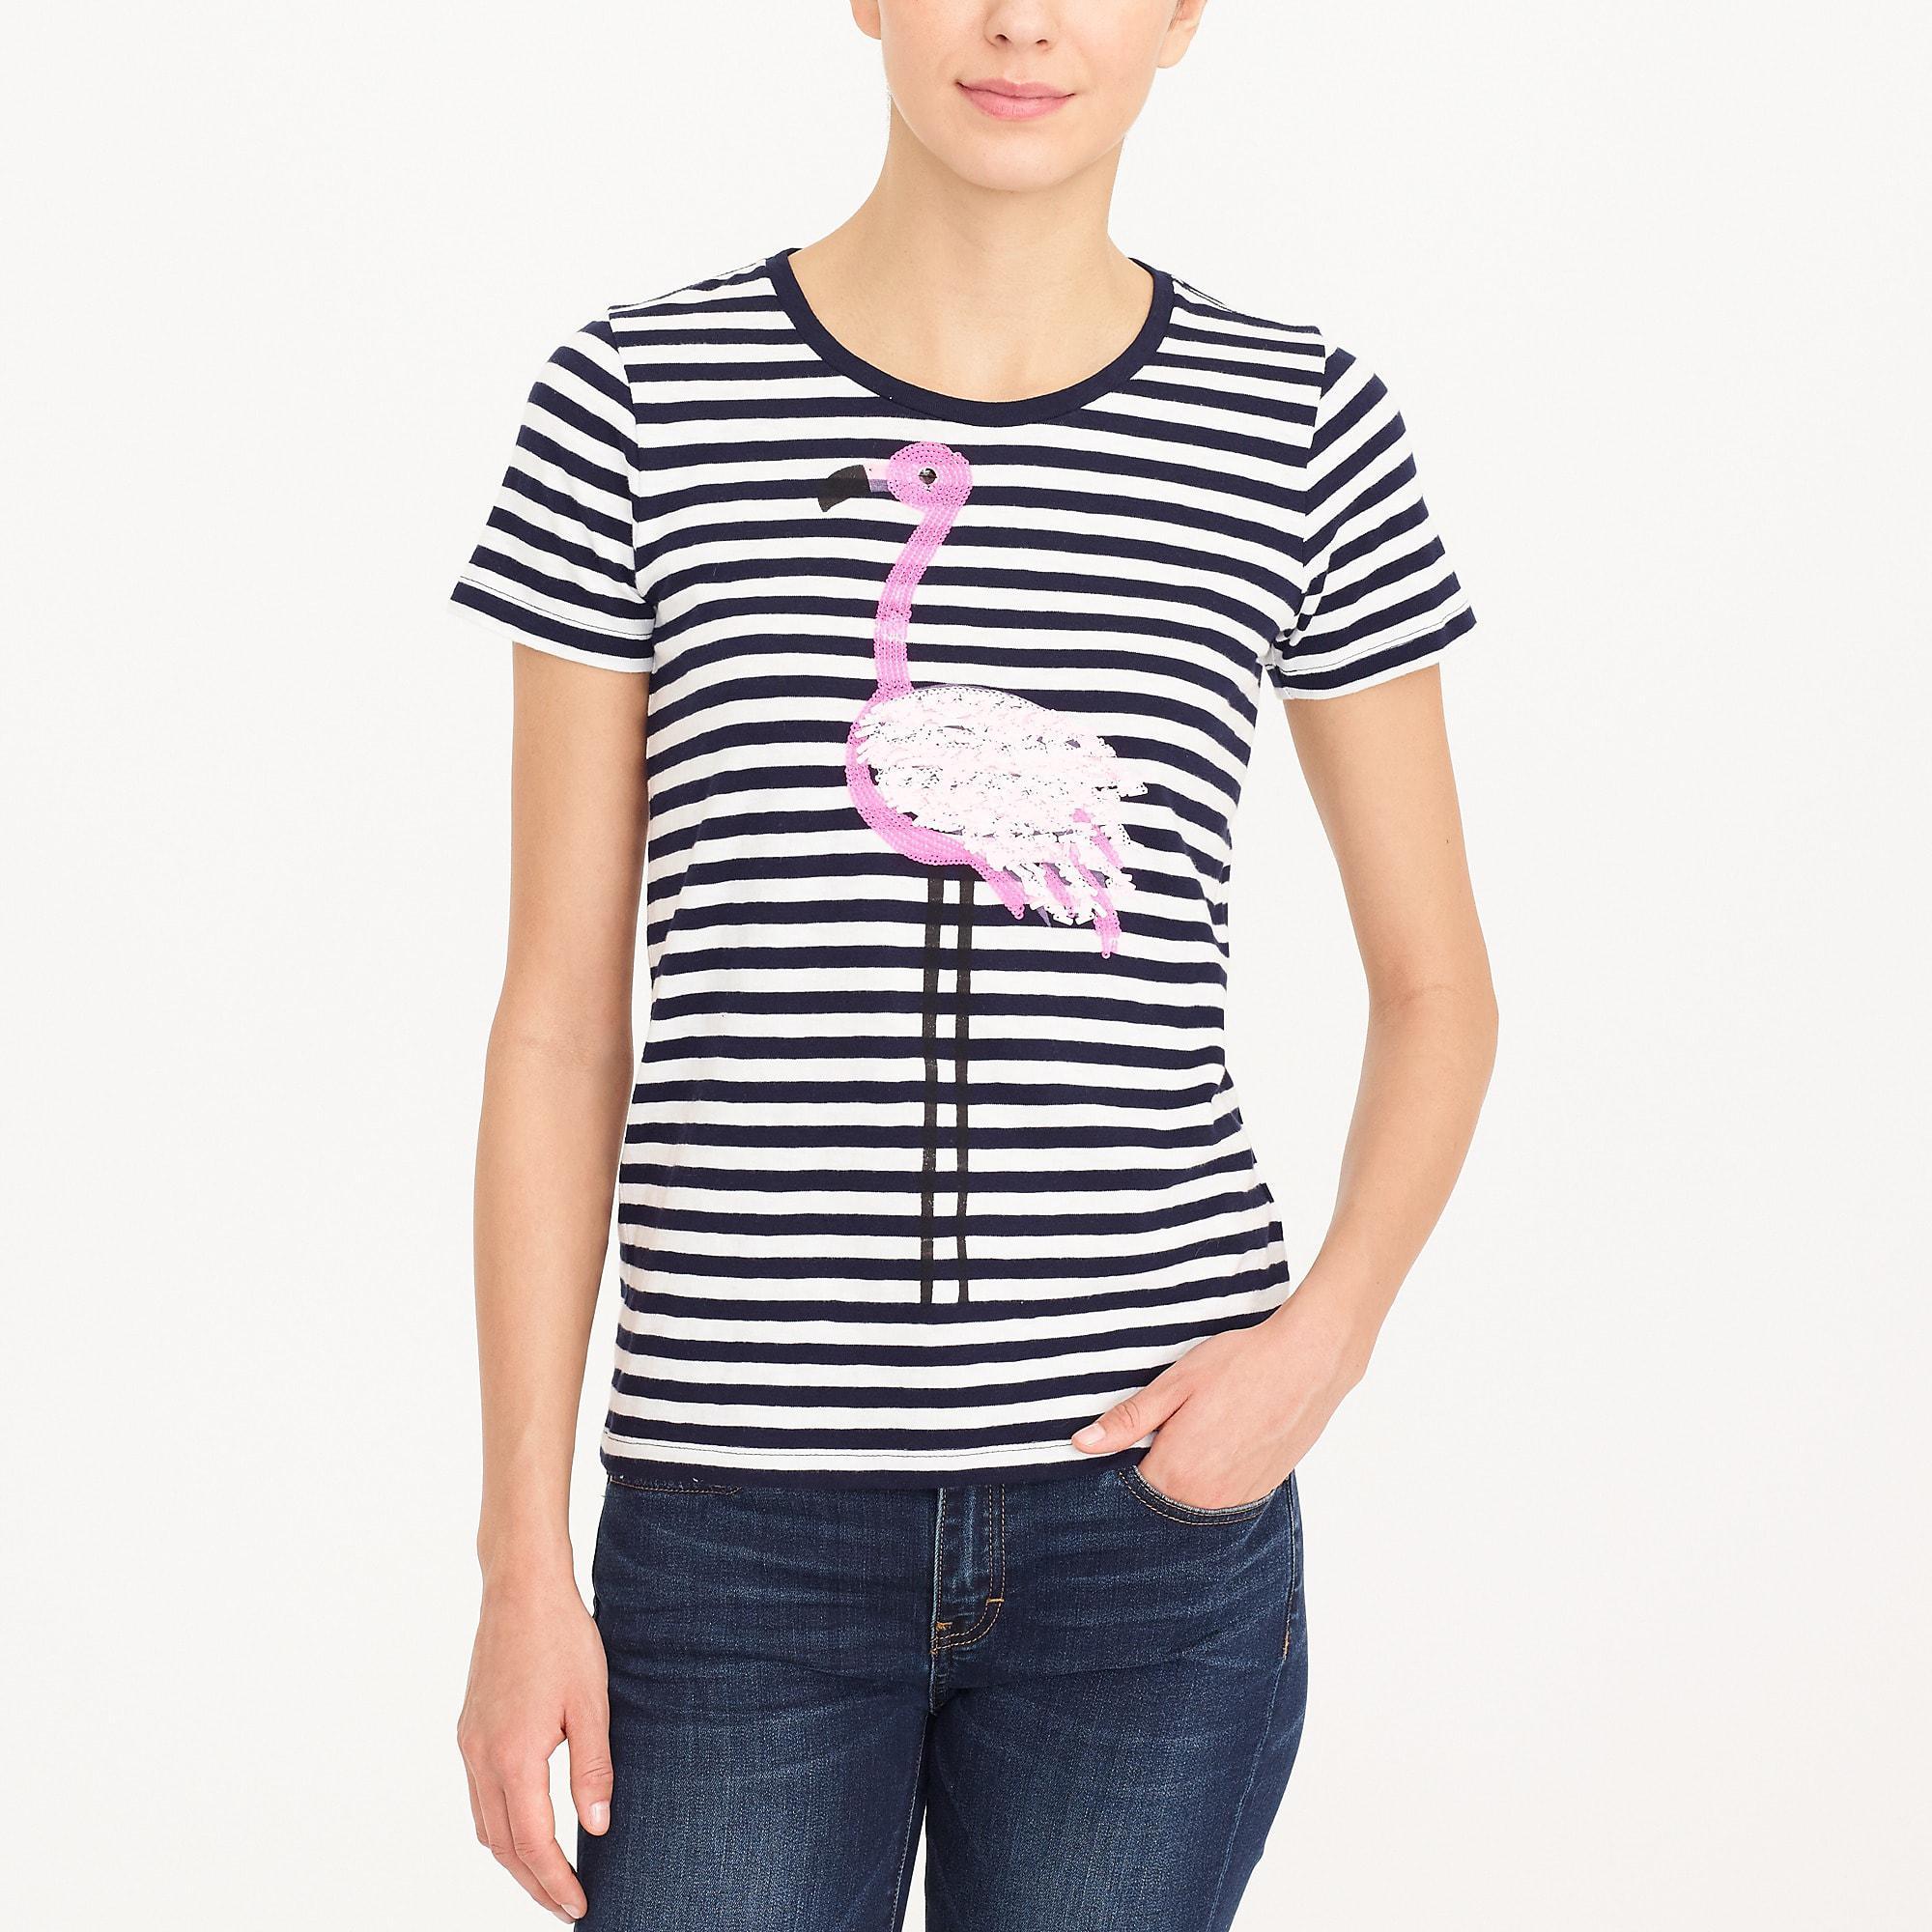 33f9b636 J.Crew. Women's Flamingo Striped Collector T-shirt